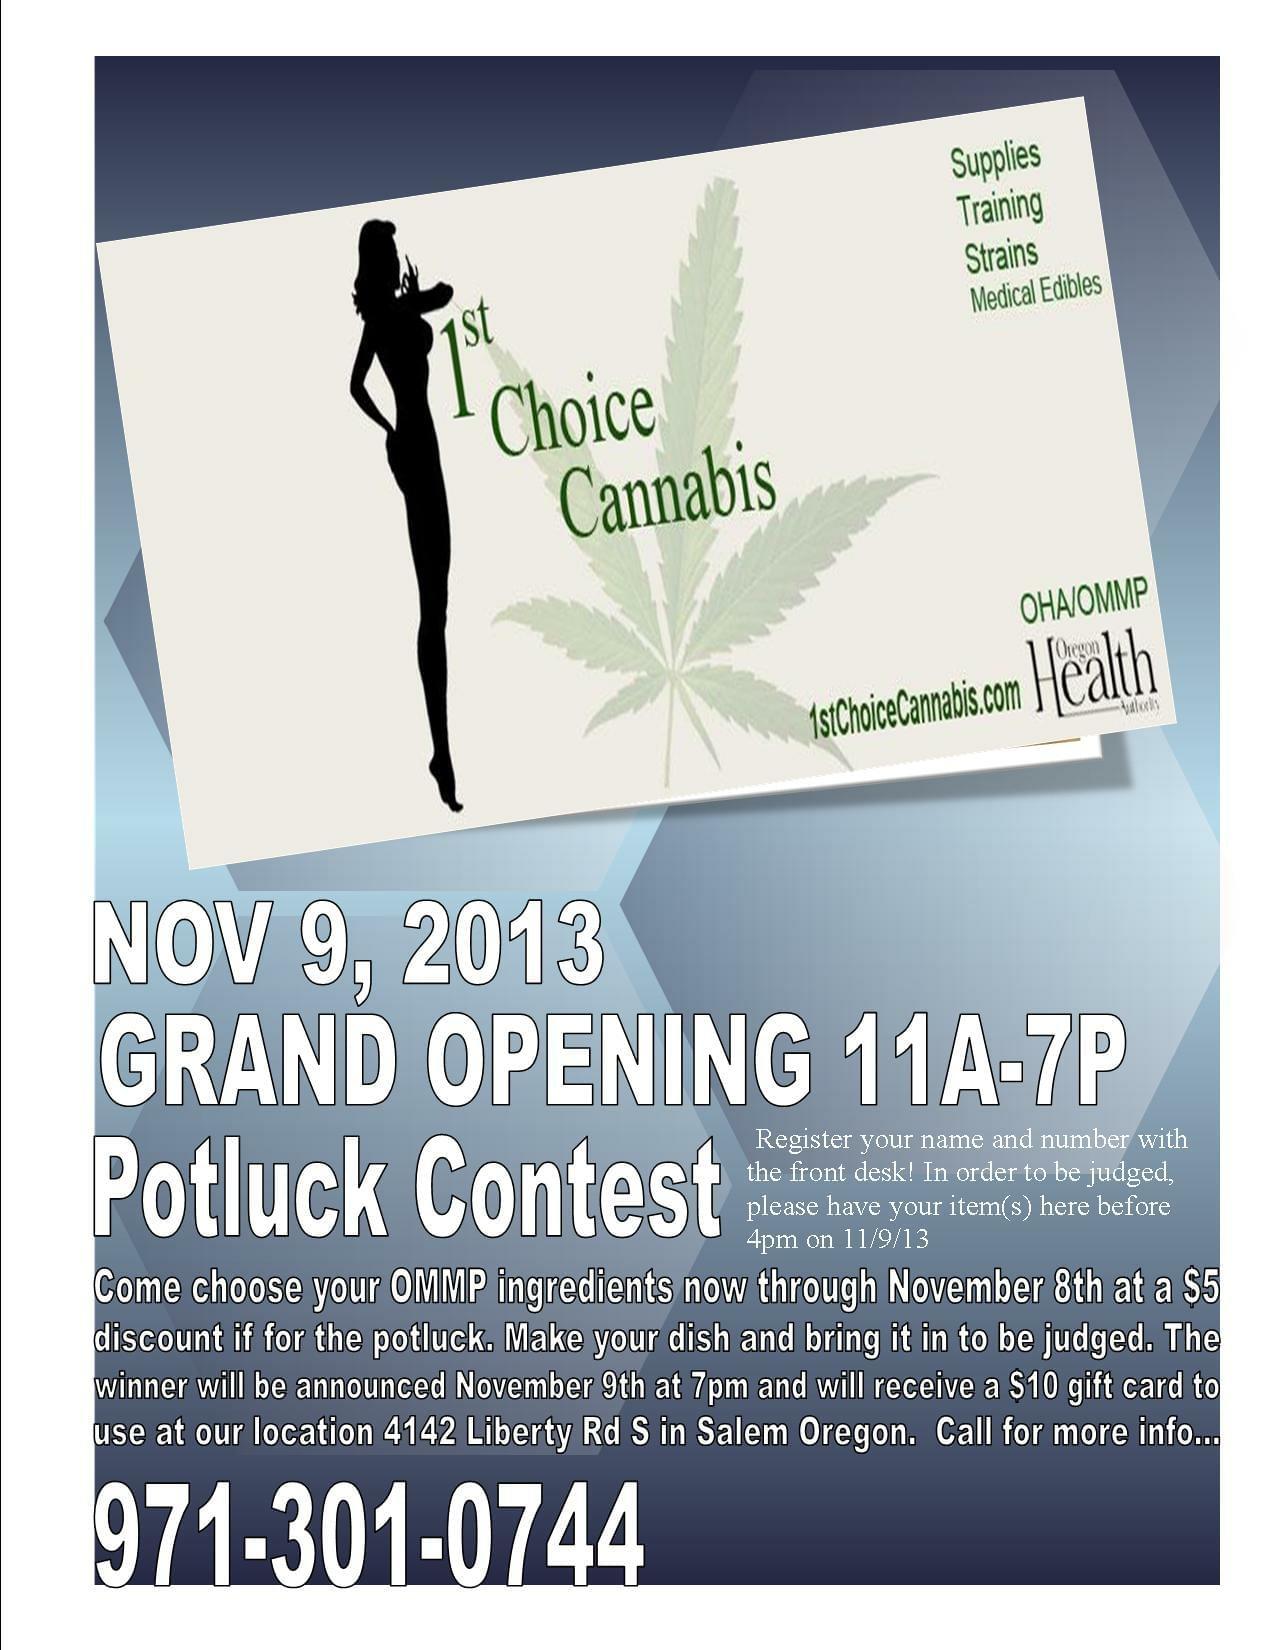 1st choice cannabis